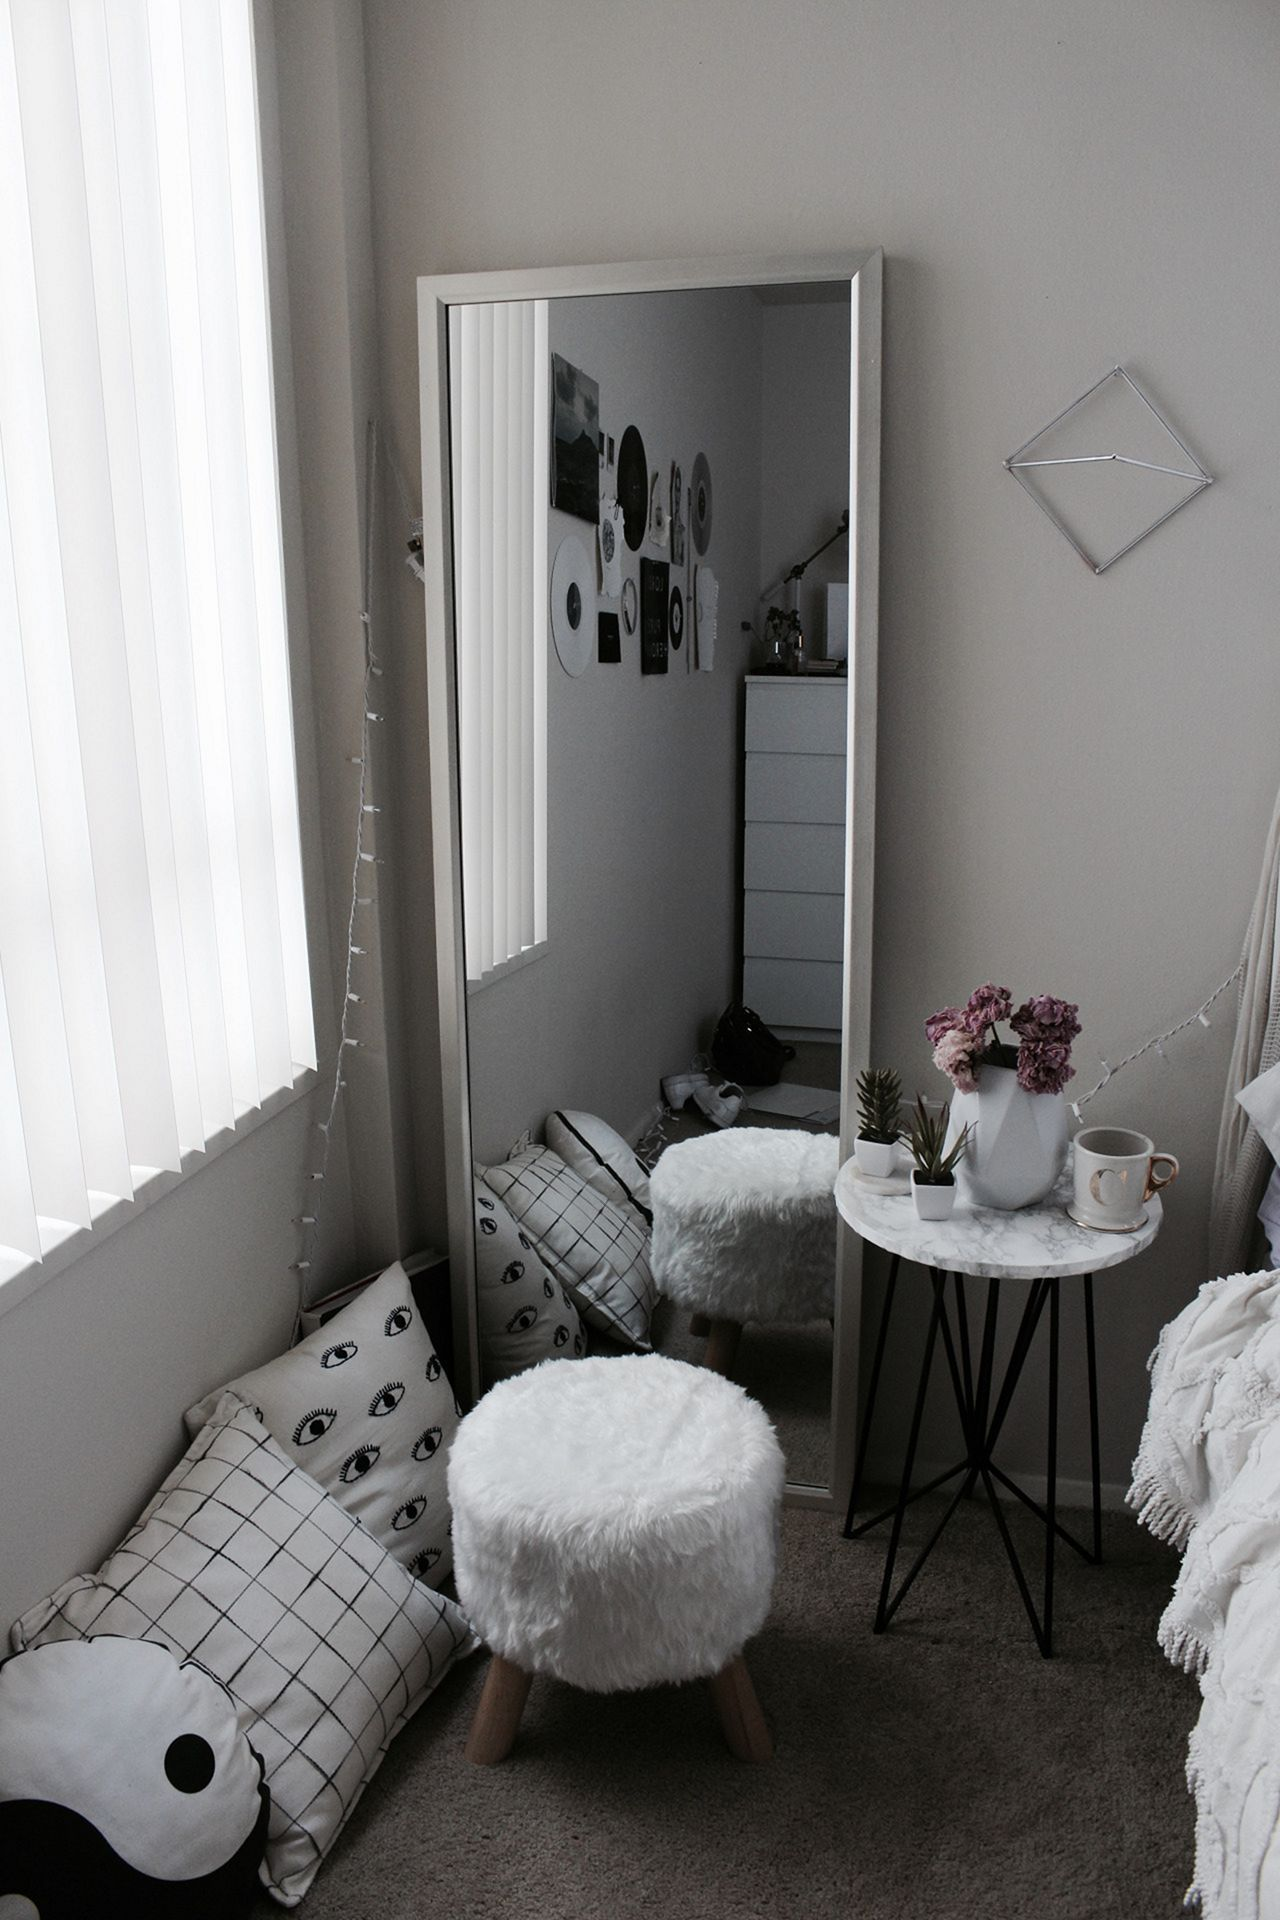 65+ Beautiful Aesthetic Room Decorations For Your ... on Room Decor Ideas De Cuartos Aesthetic id=91375